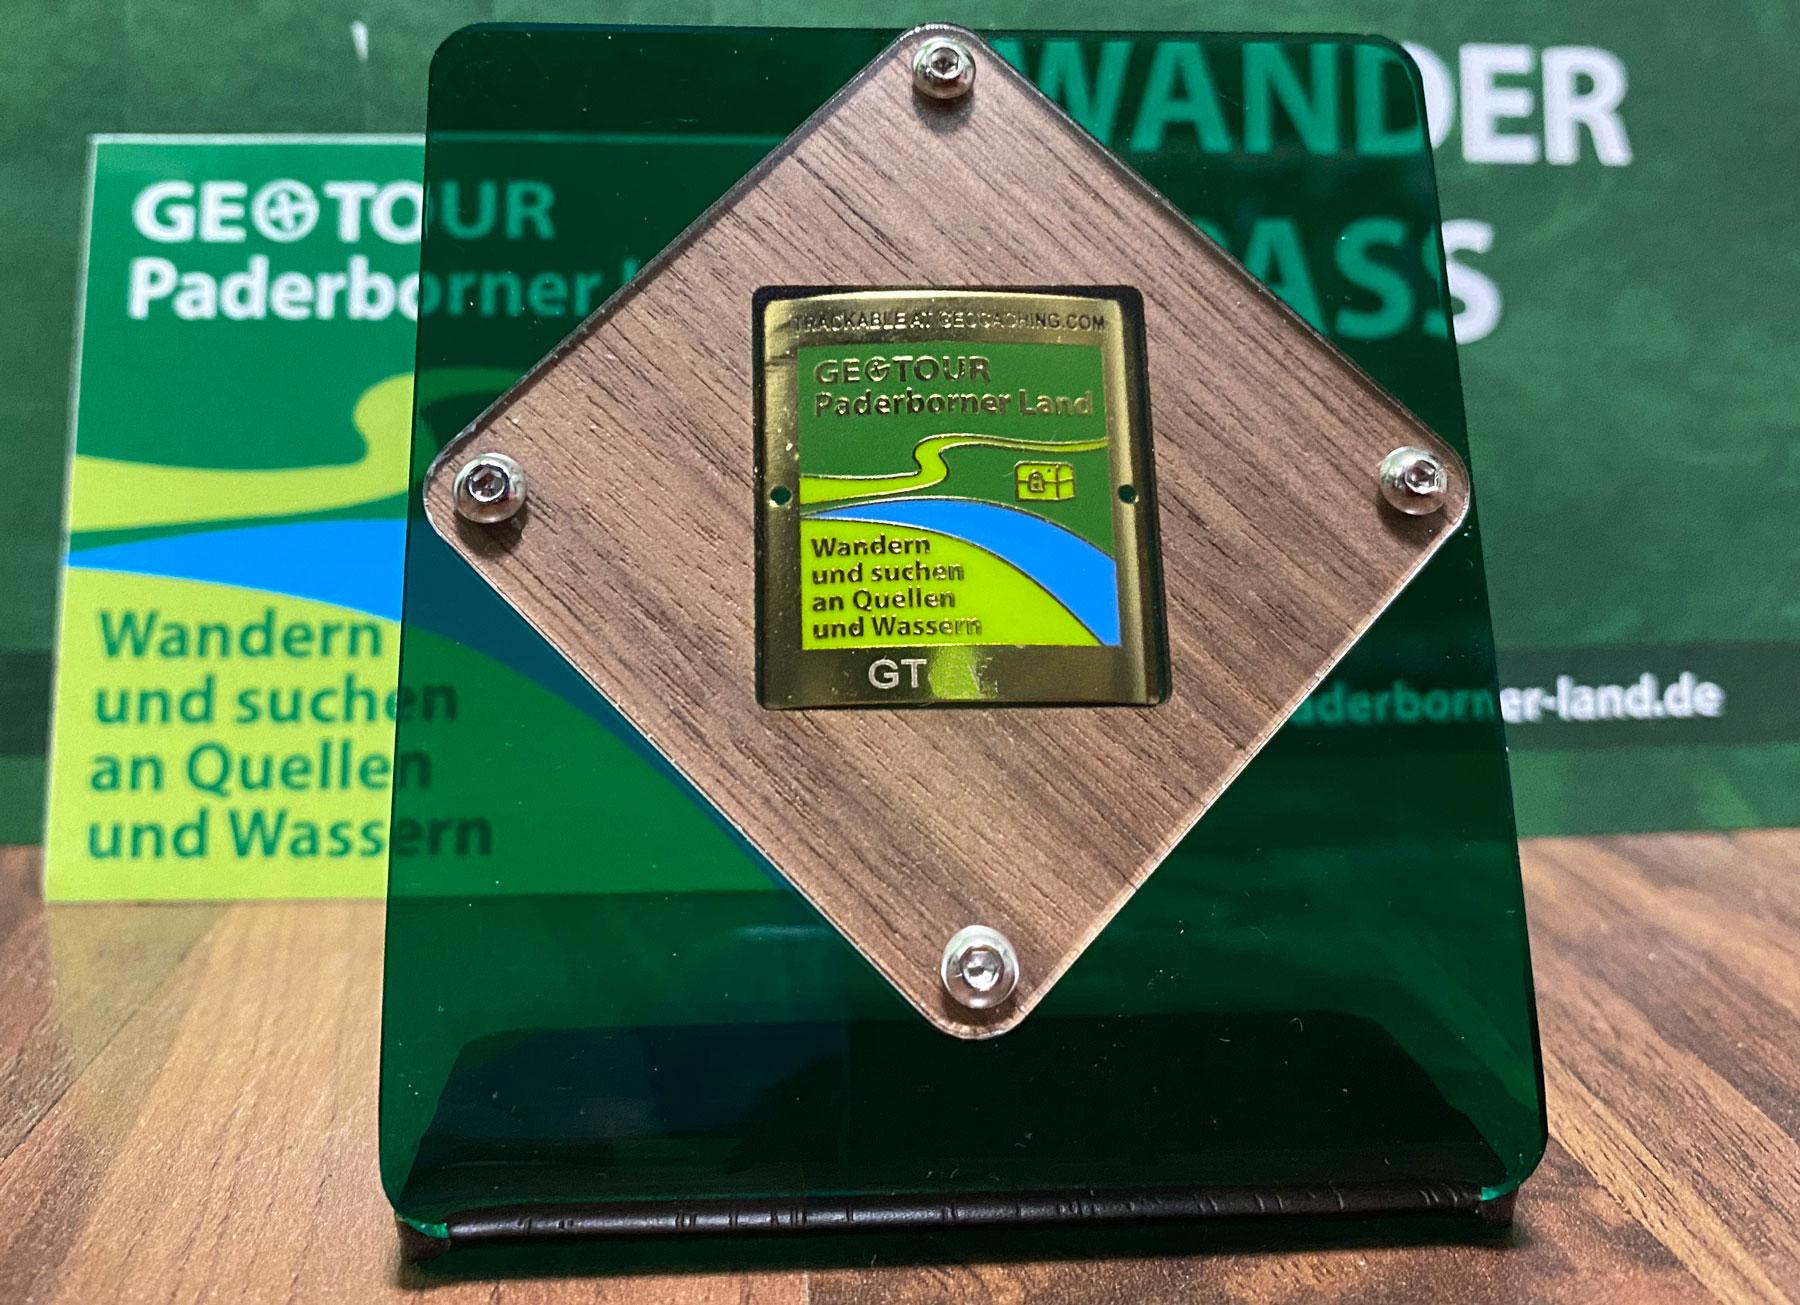 Neu: Der Geotour Coin-Präsenter